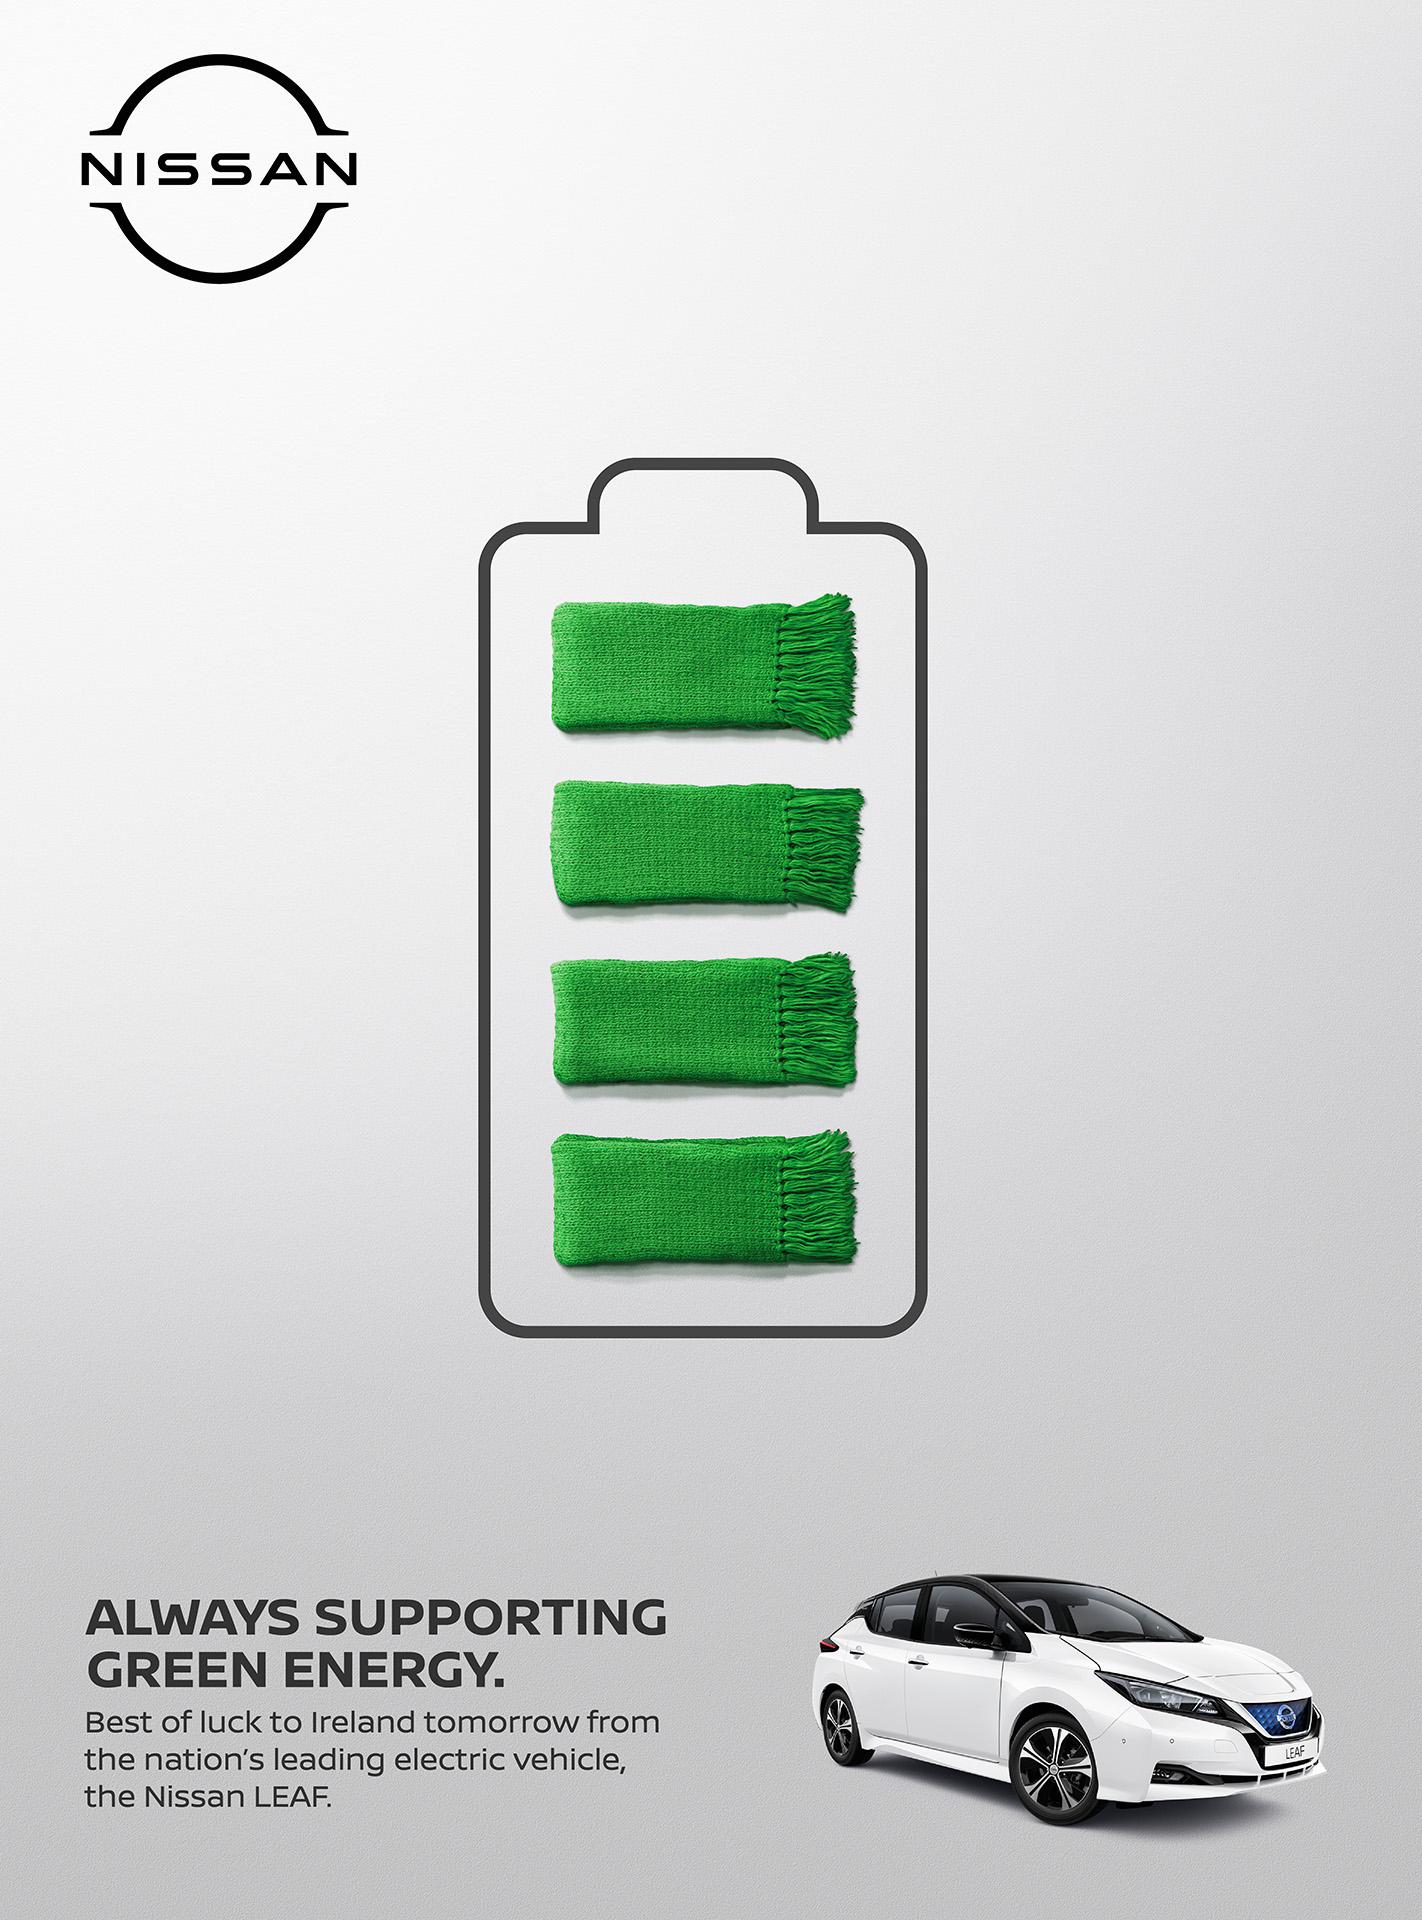 Nissan Green Energy